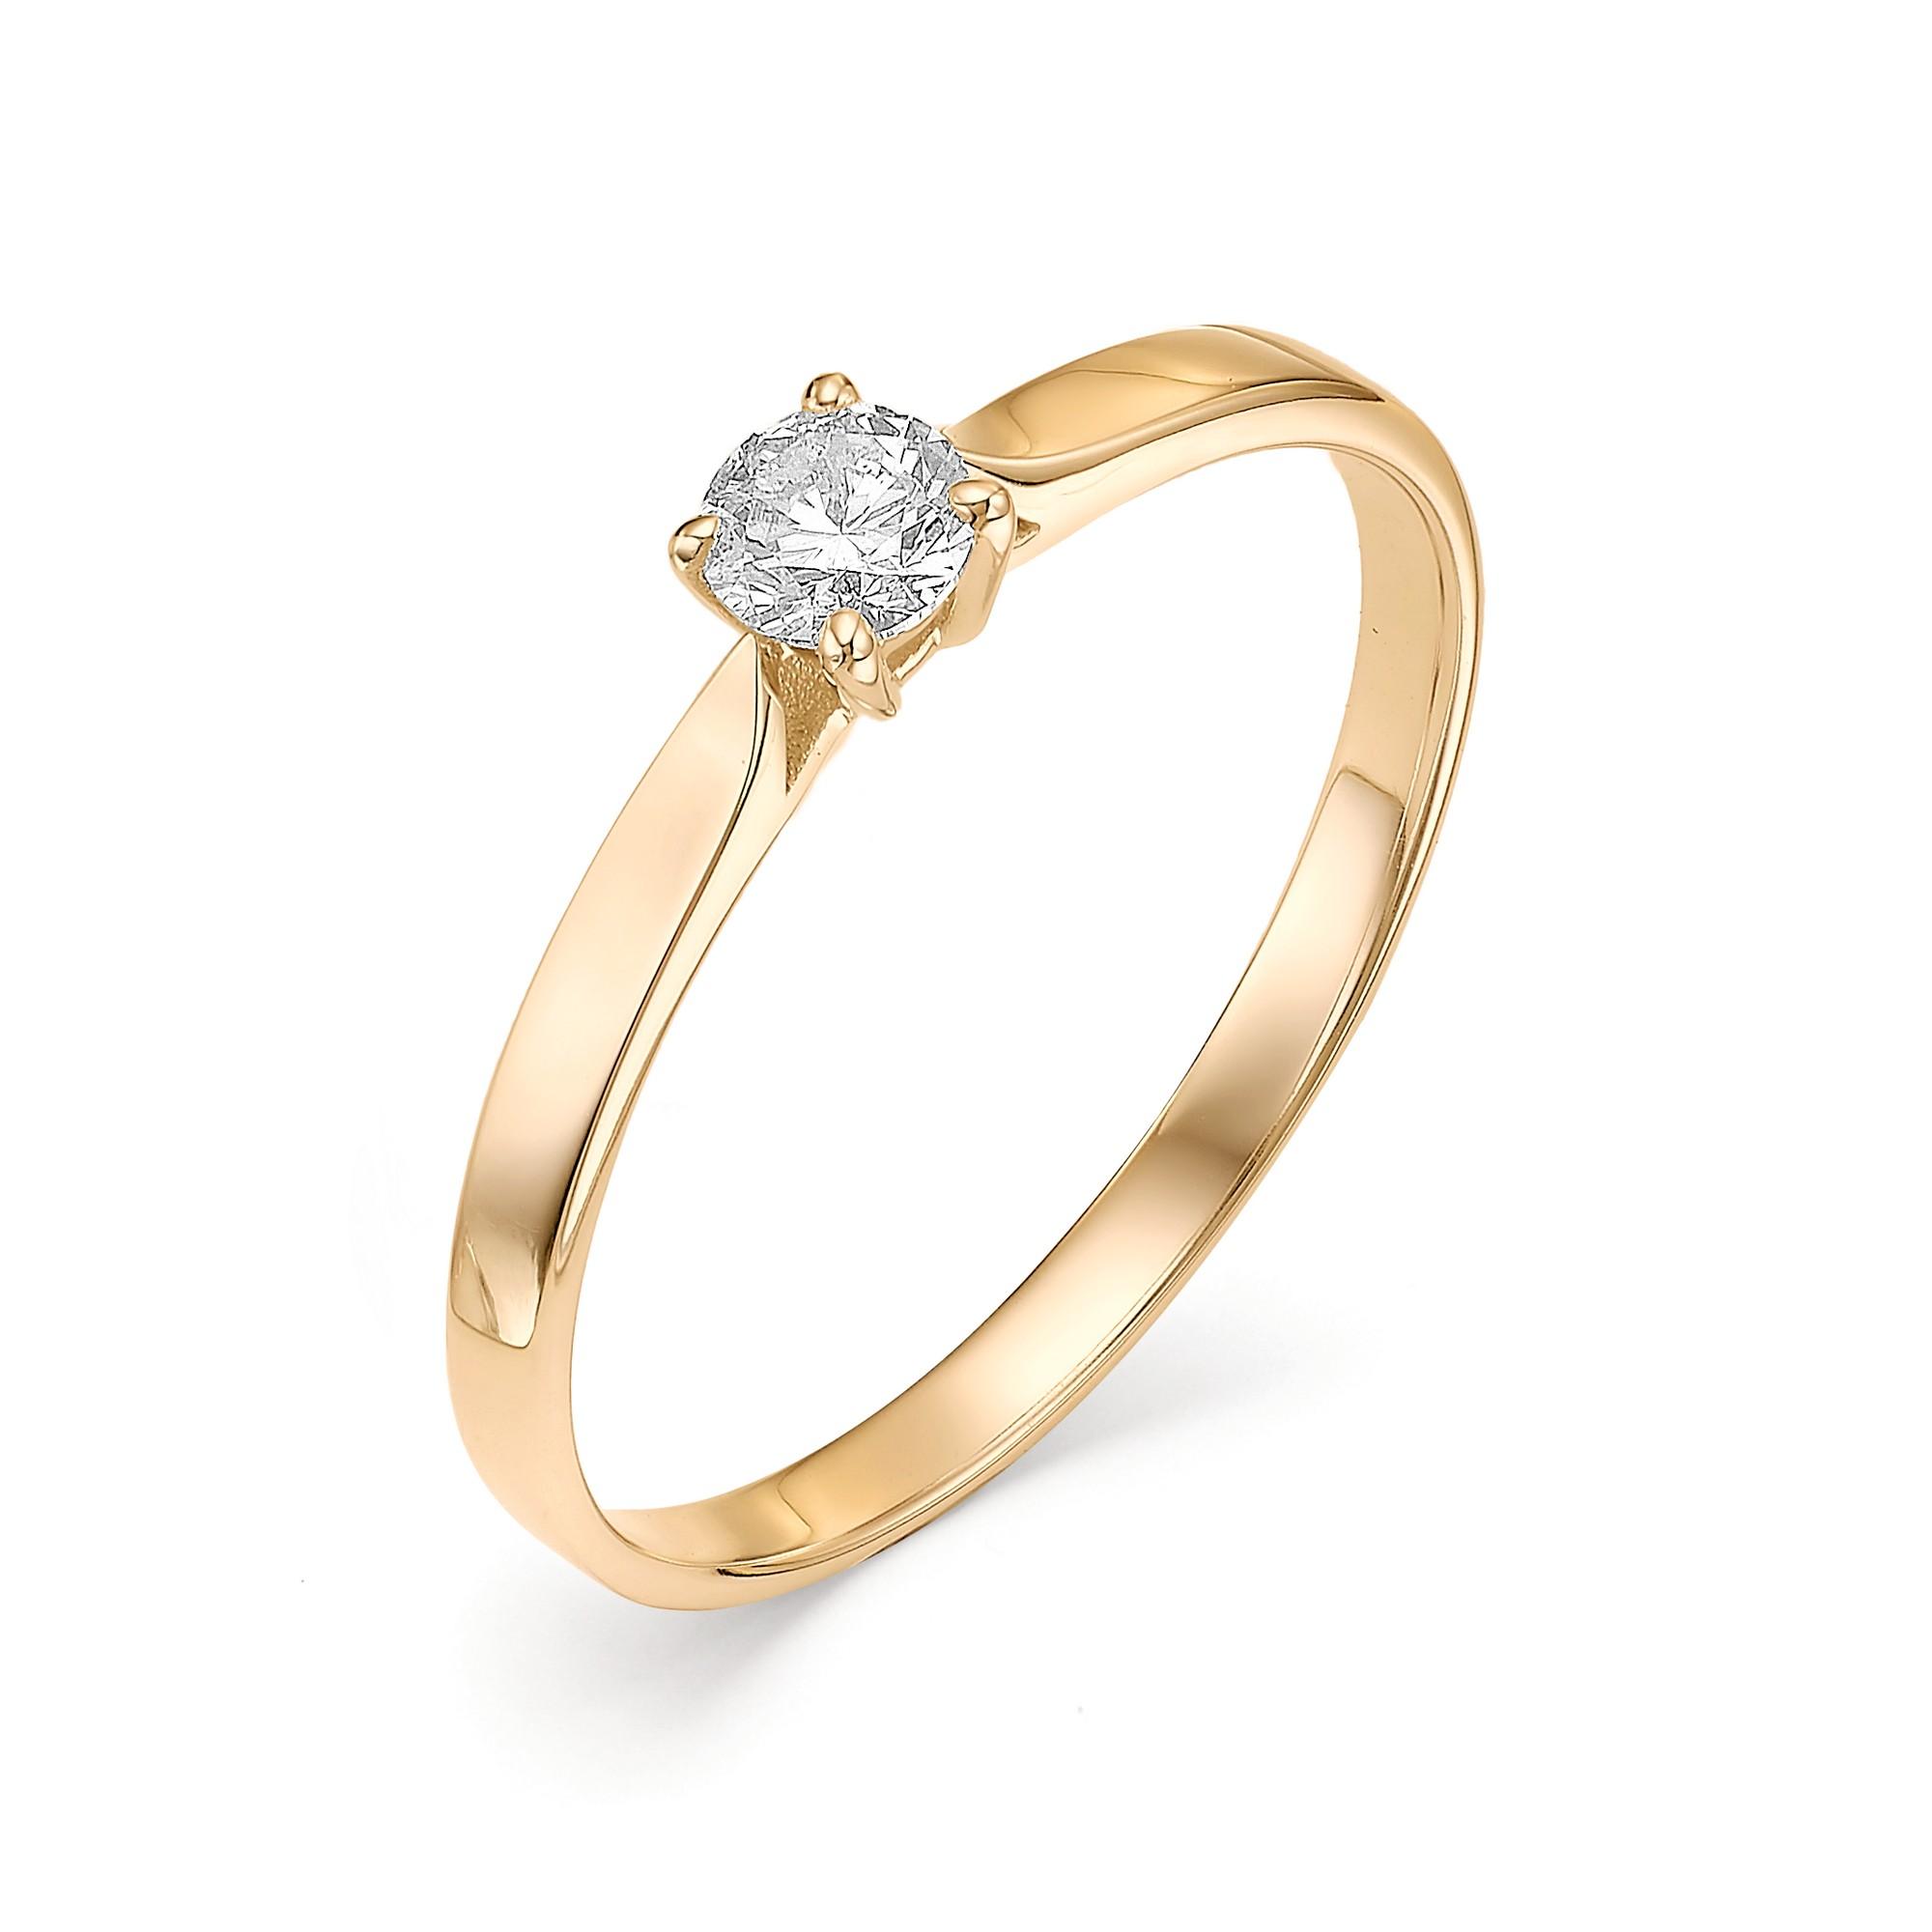 картинка кольцо 12428-100 1 бриллиант круг 57 0,203 5-6 4/5а 12428-100